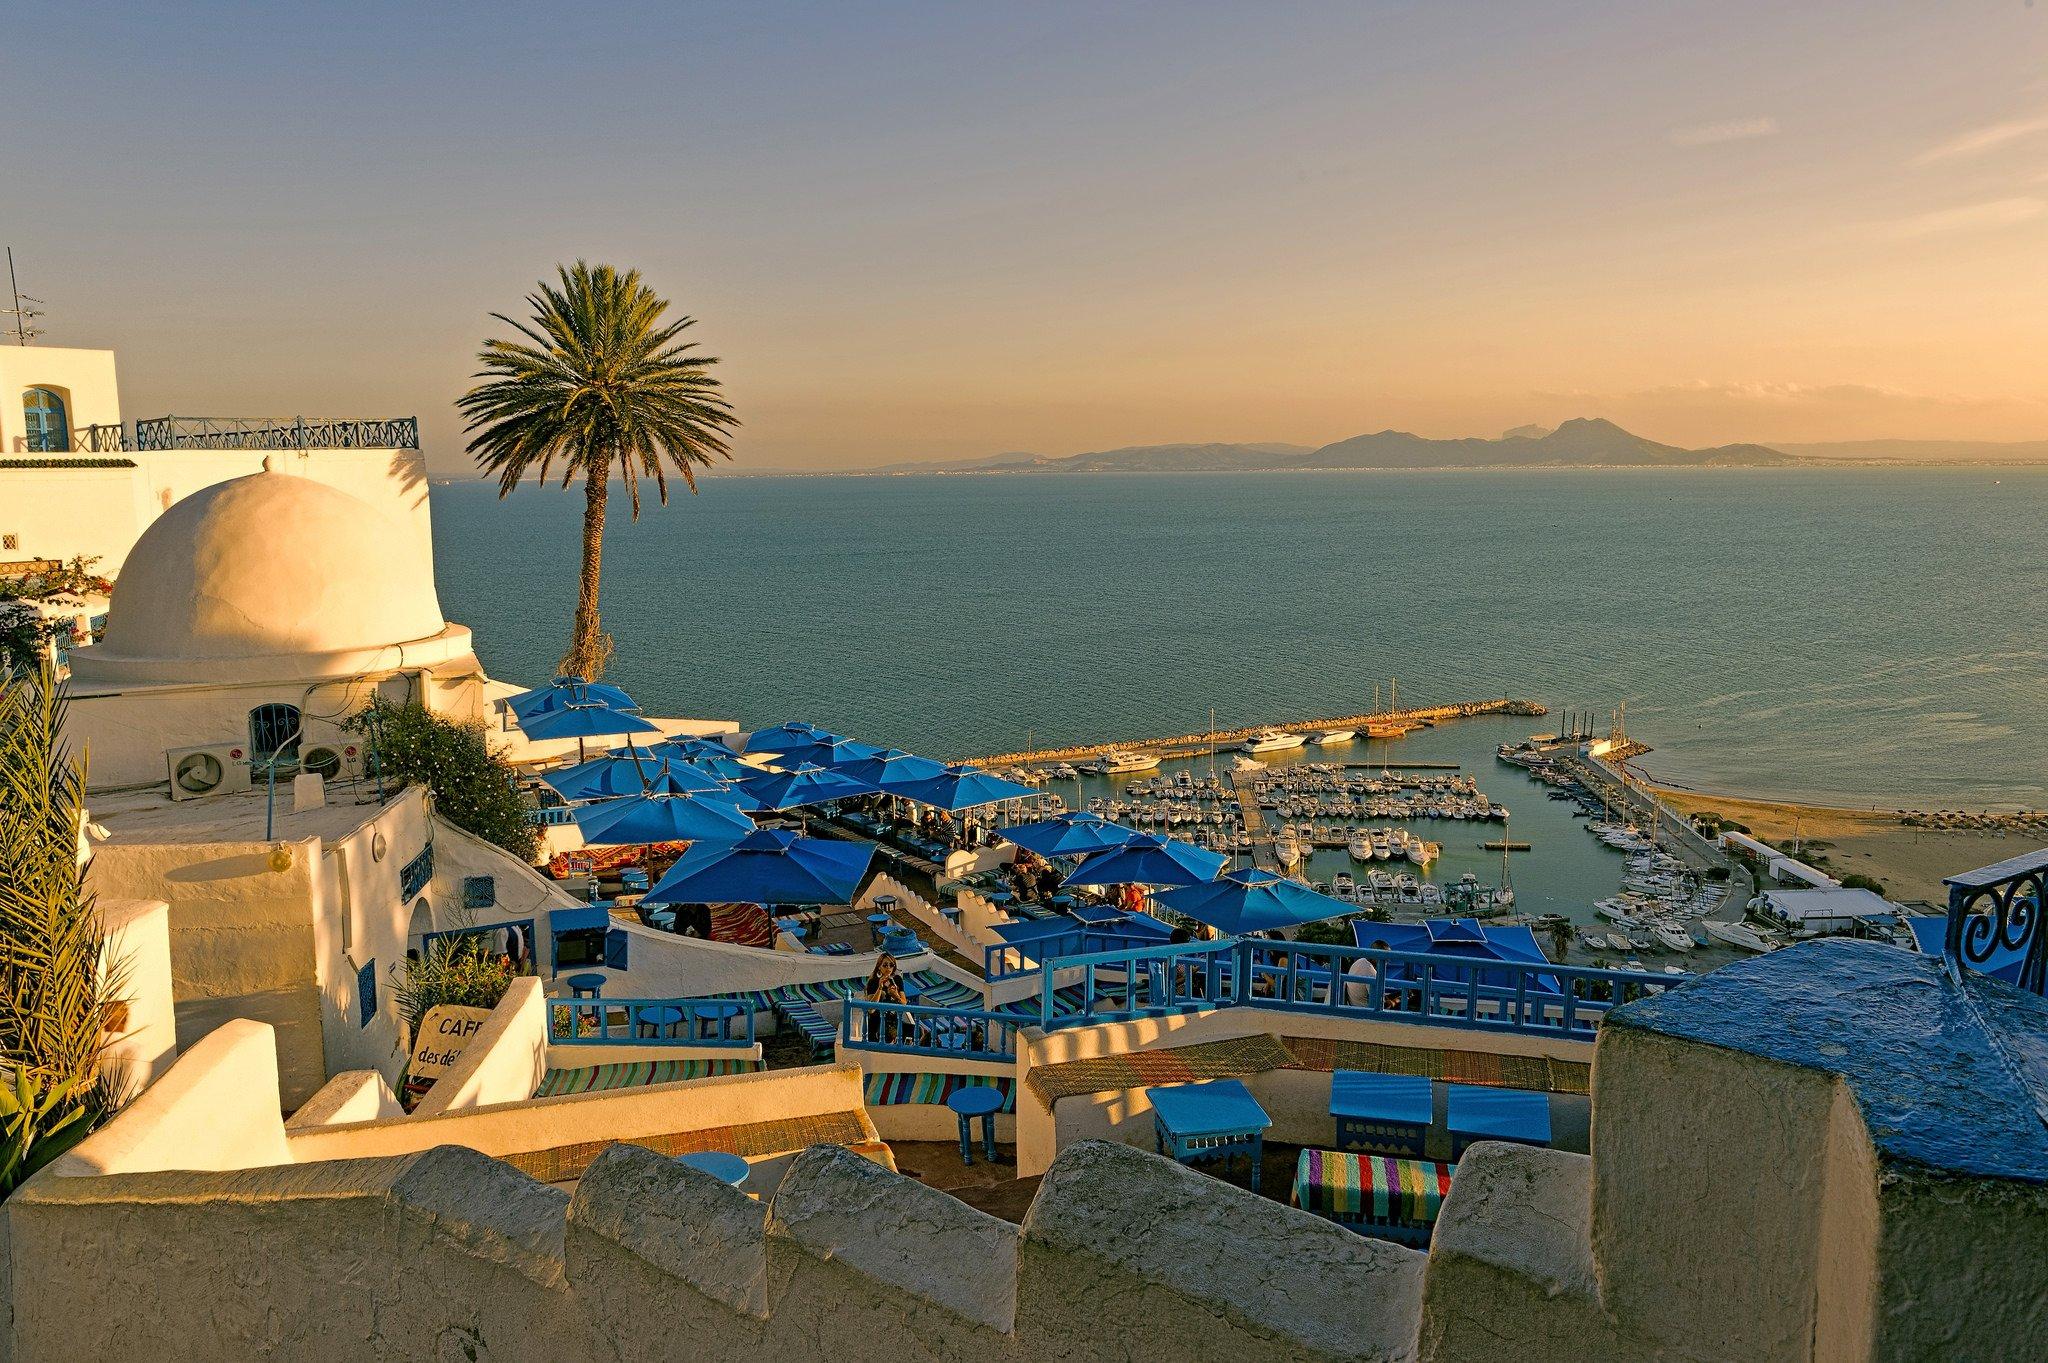 Картинки тунис, своими руками день